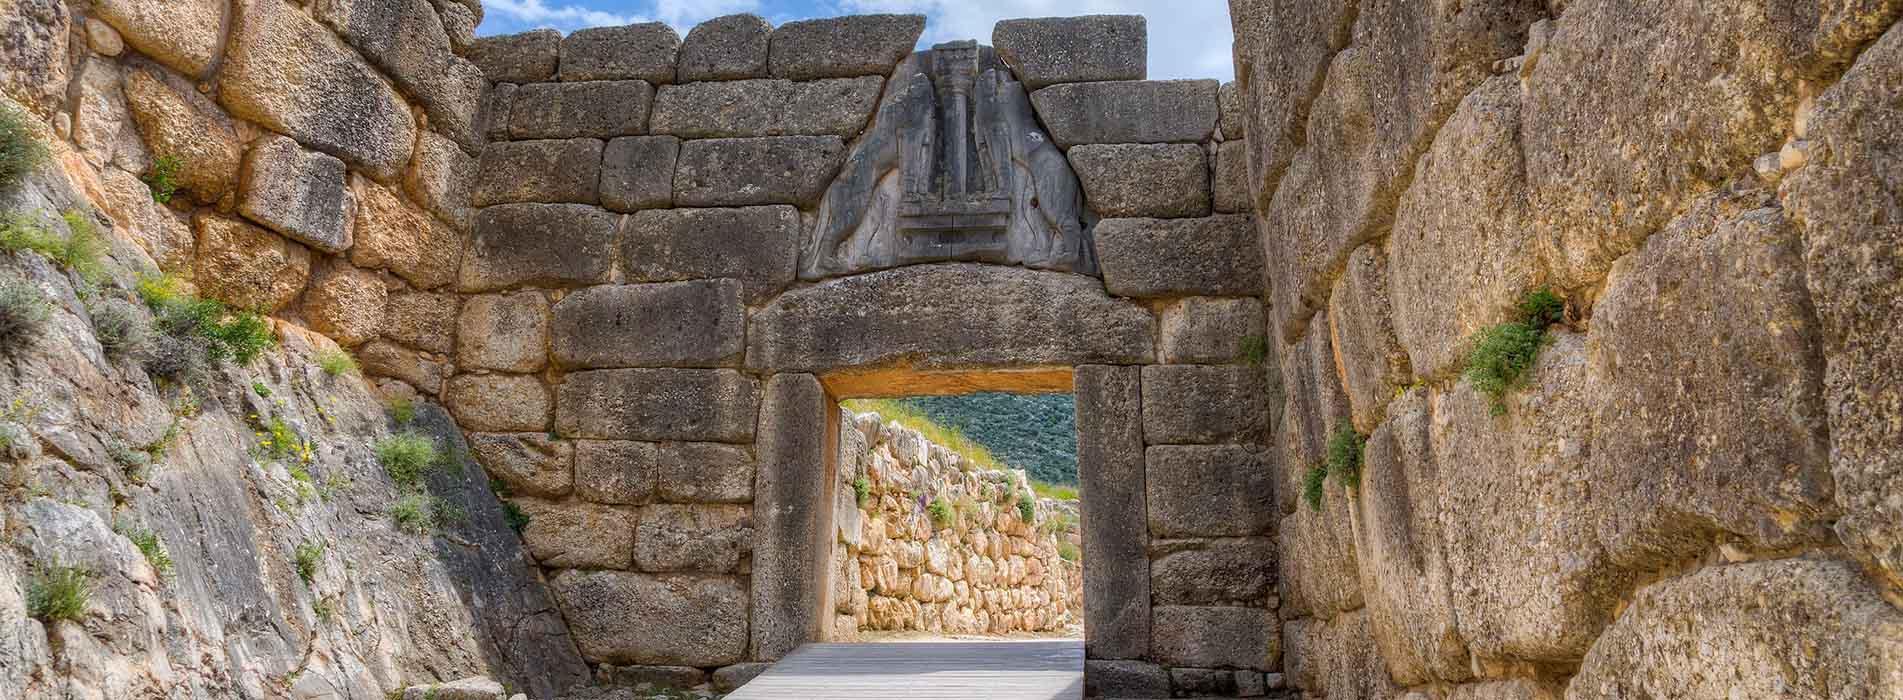 Greece - Mycenae 1 (main)